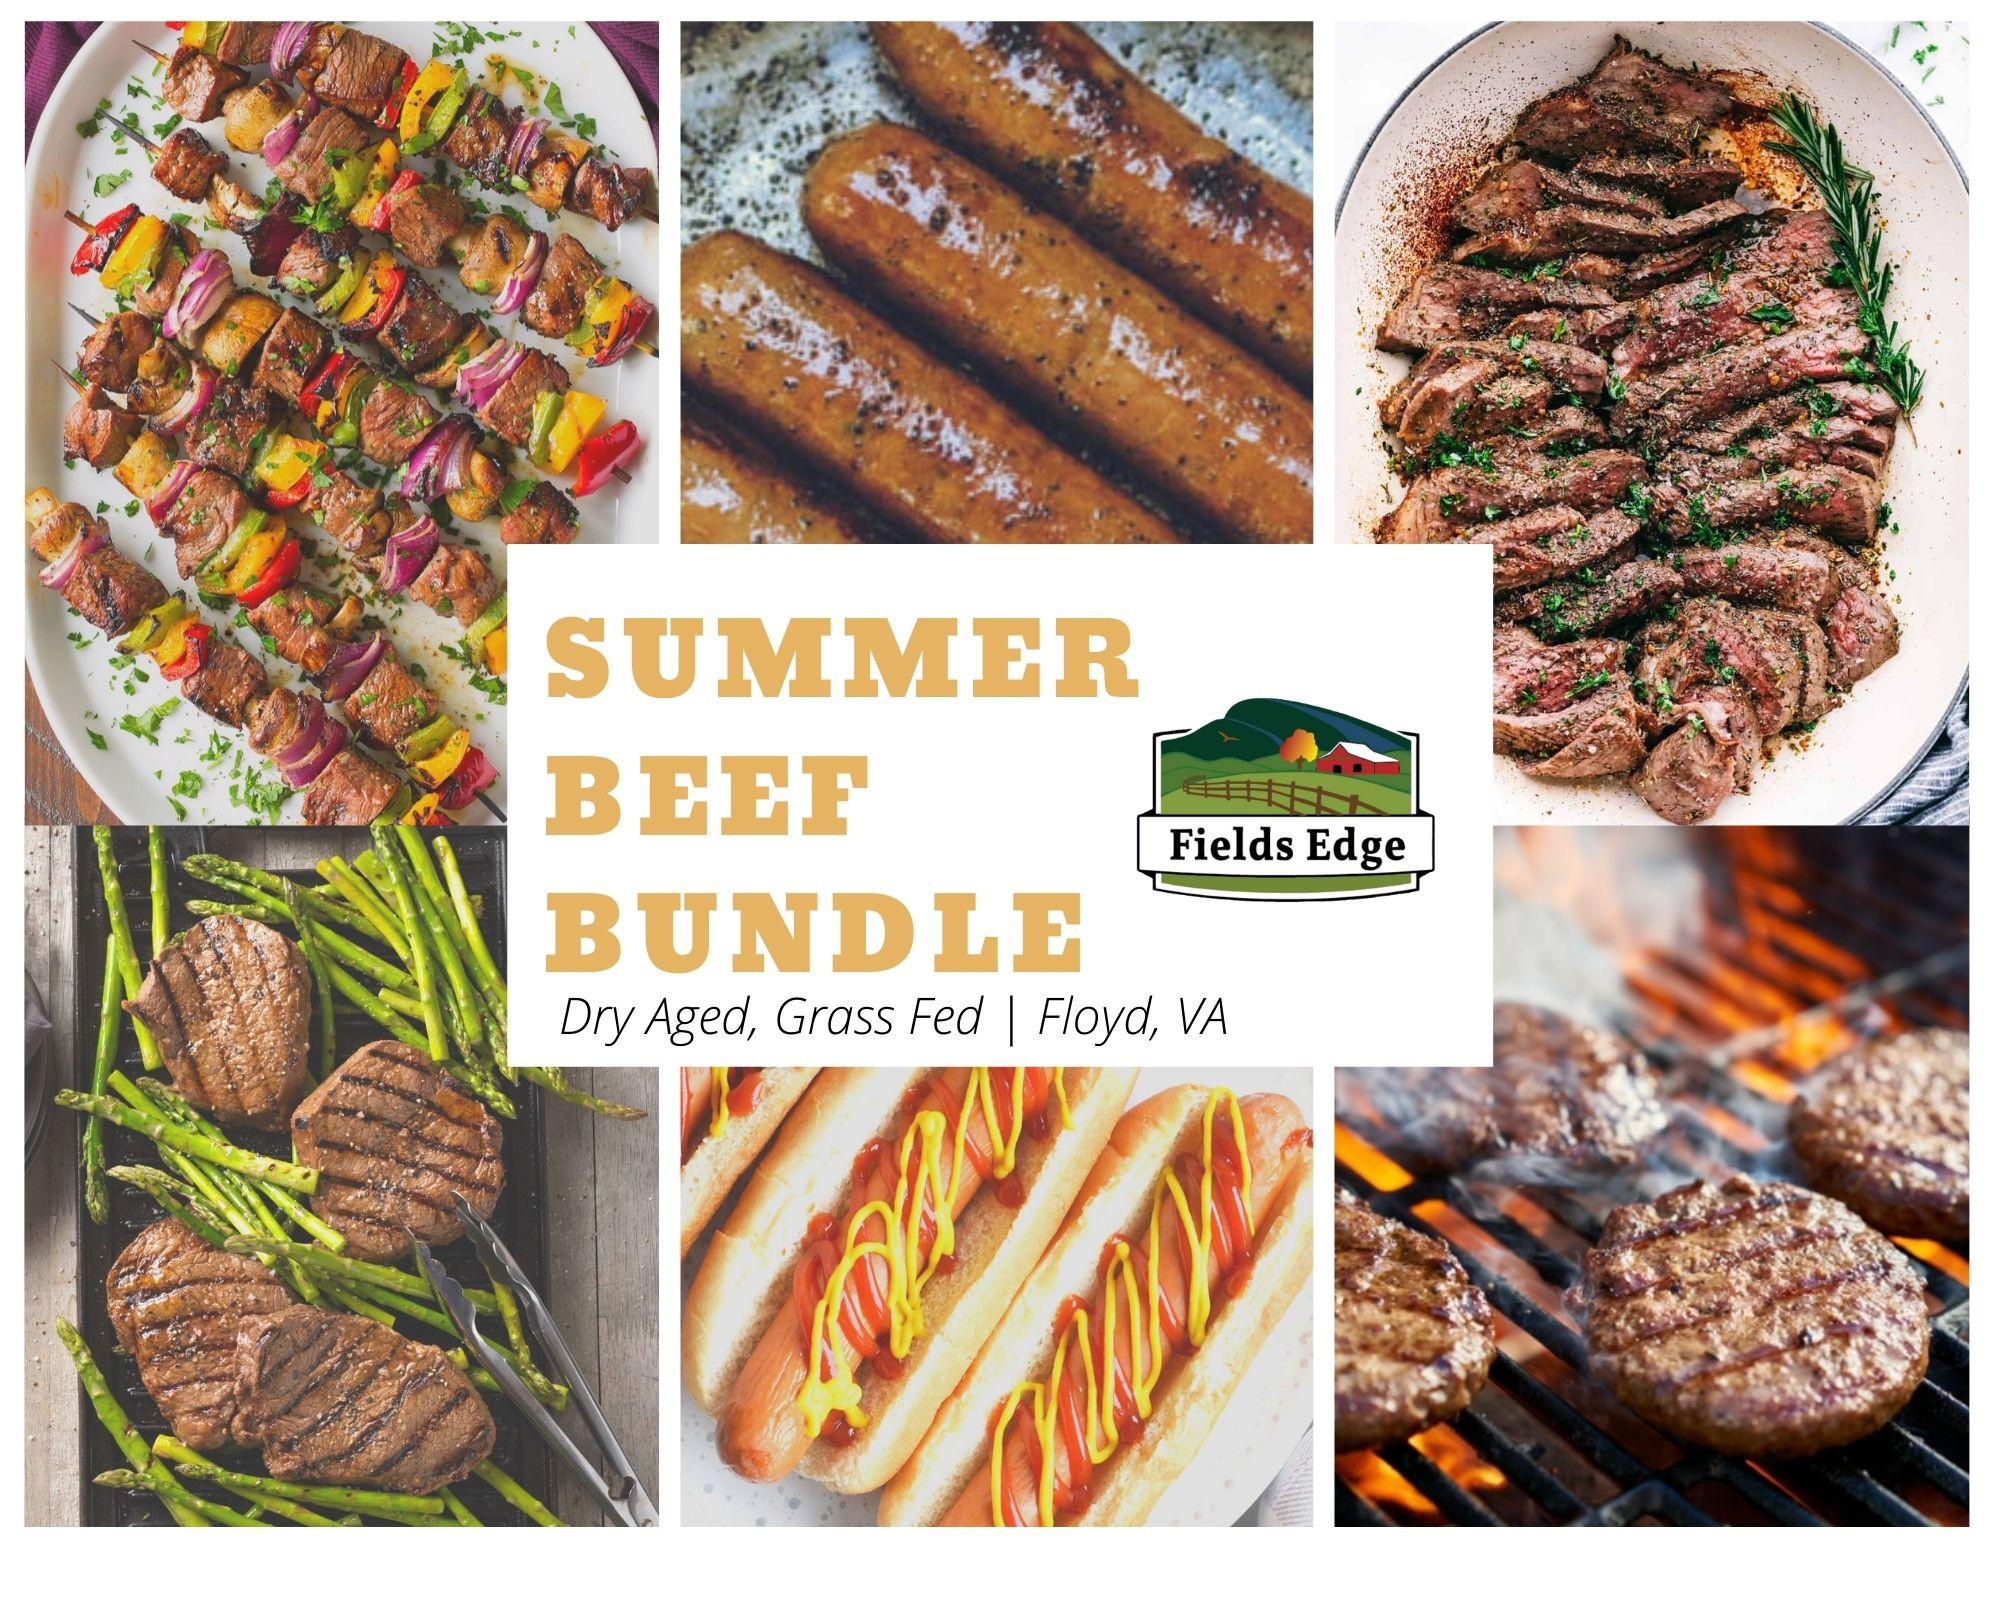 Summer Beef Bundle